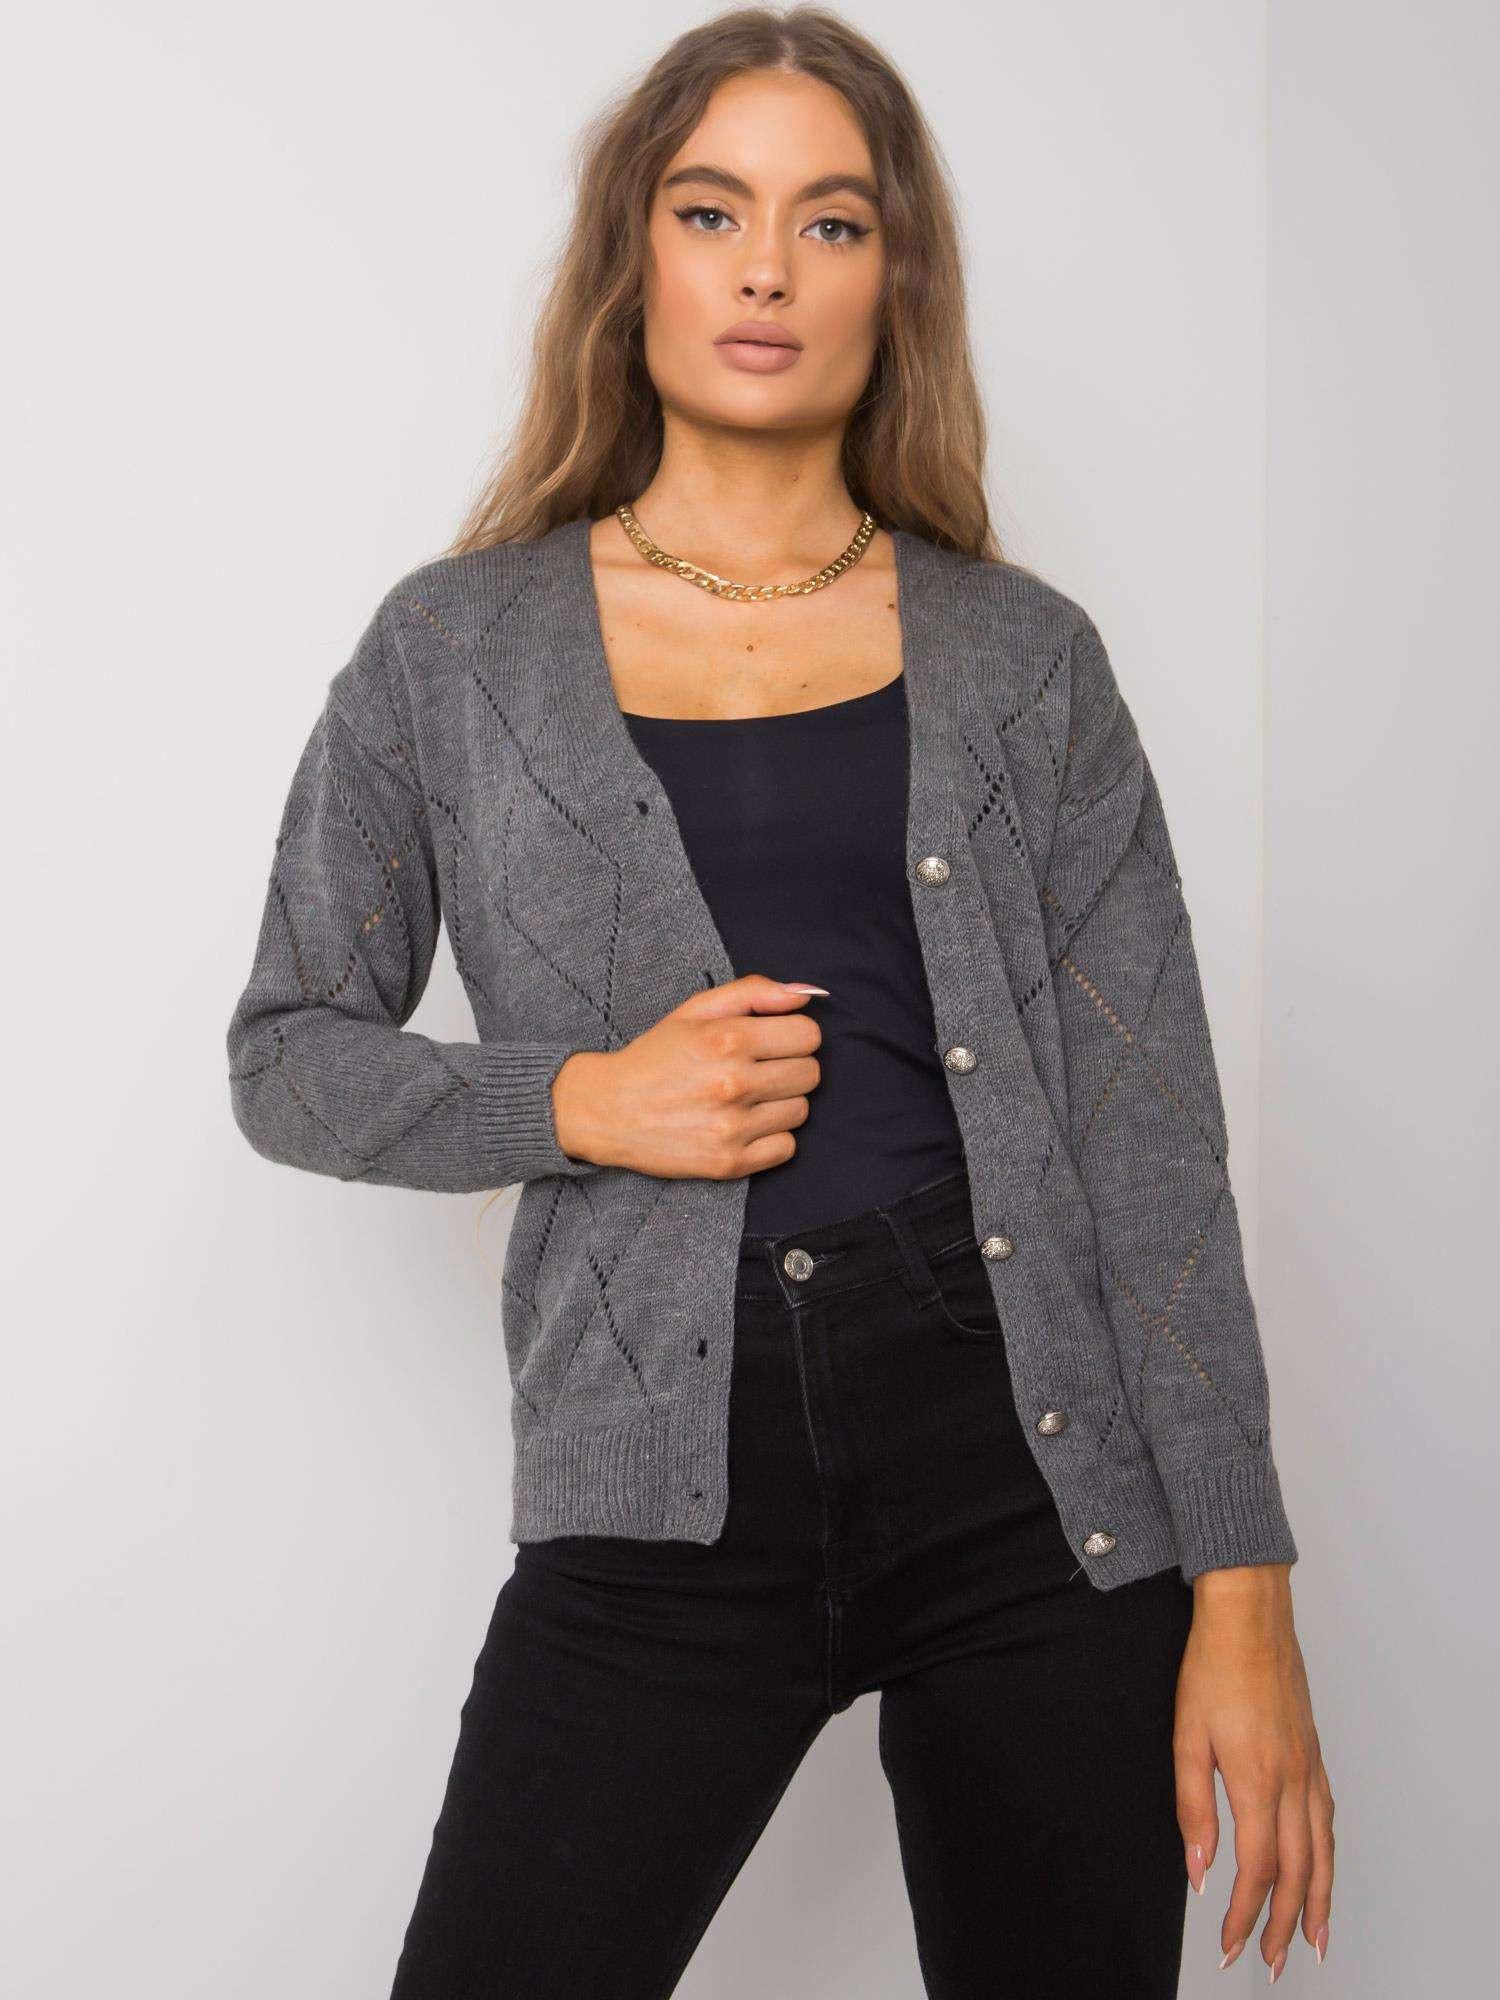 RUE PARIS Dámsky tmavo šedý sveter na gombíky jedna velikost